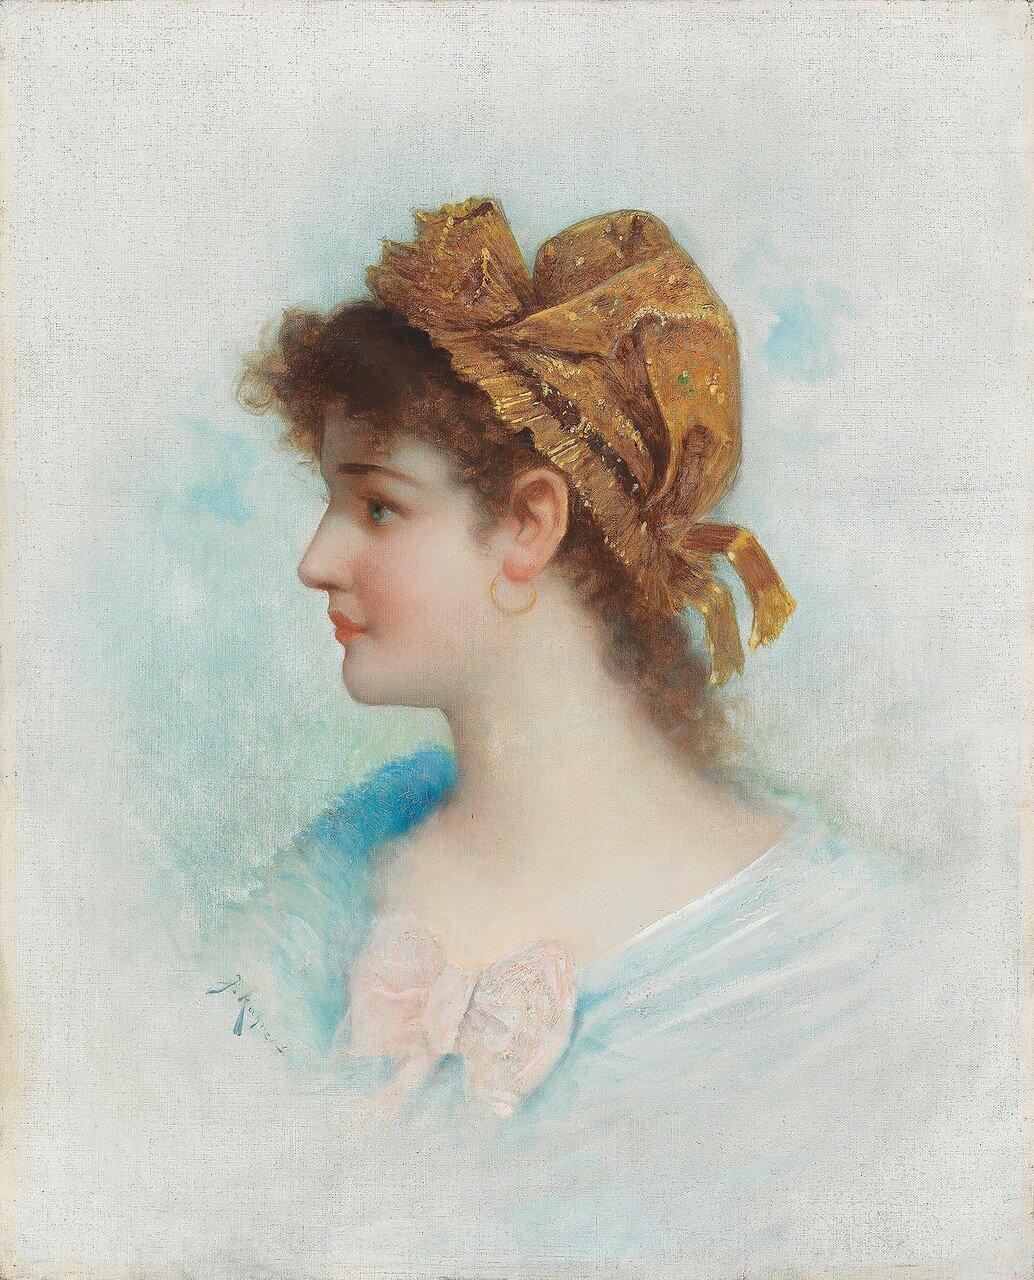 J. Kahrer, um 1900 Damenportrait mit Goldhäubchen, signiert J. Kahrer